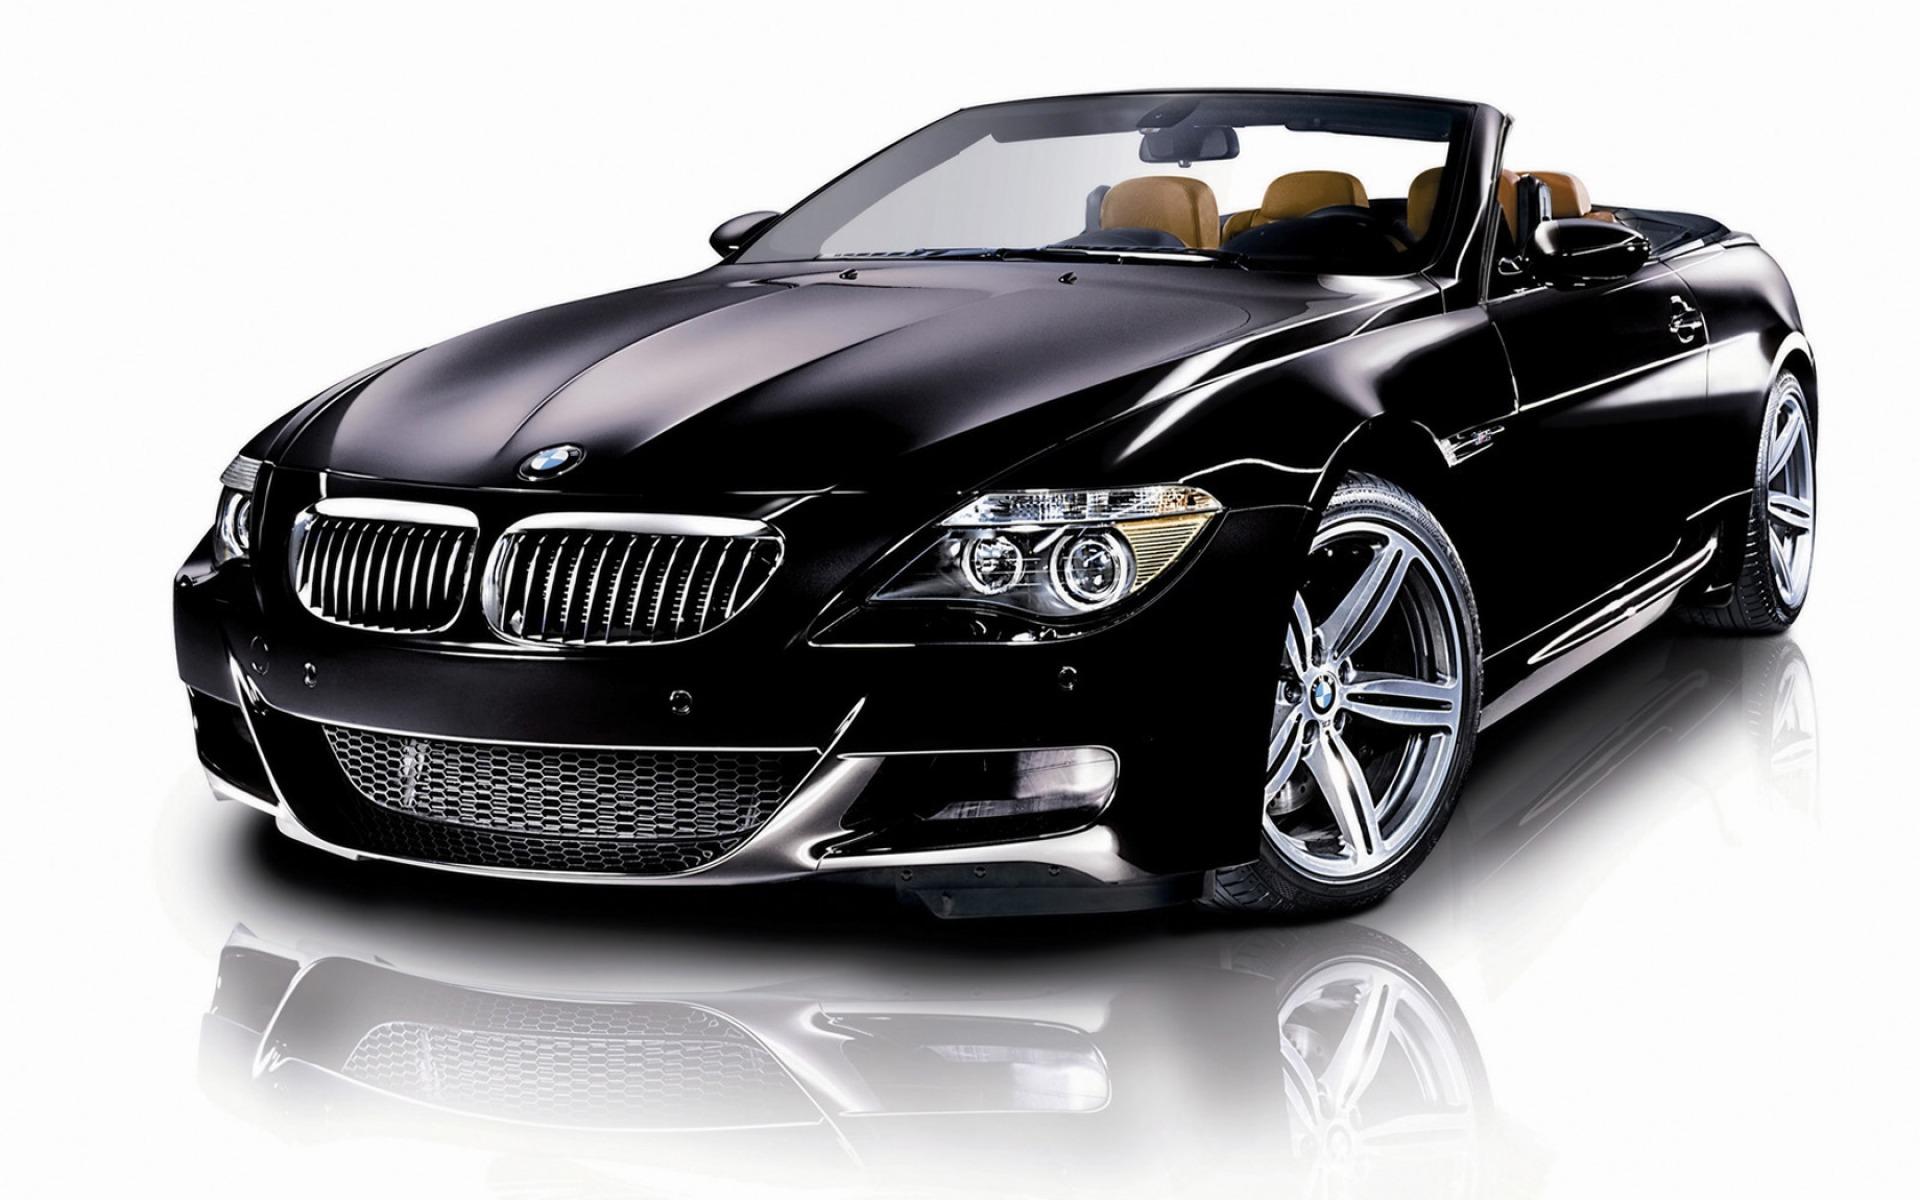 public://images/exec-life-images/2015/01/22/bmw-cars-picture.jpg